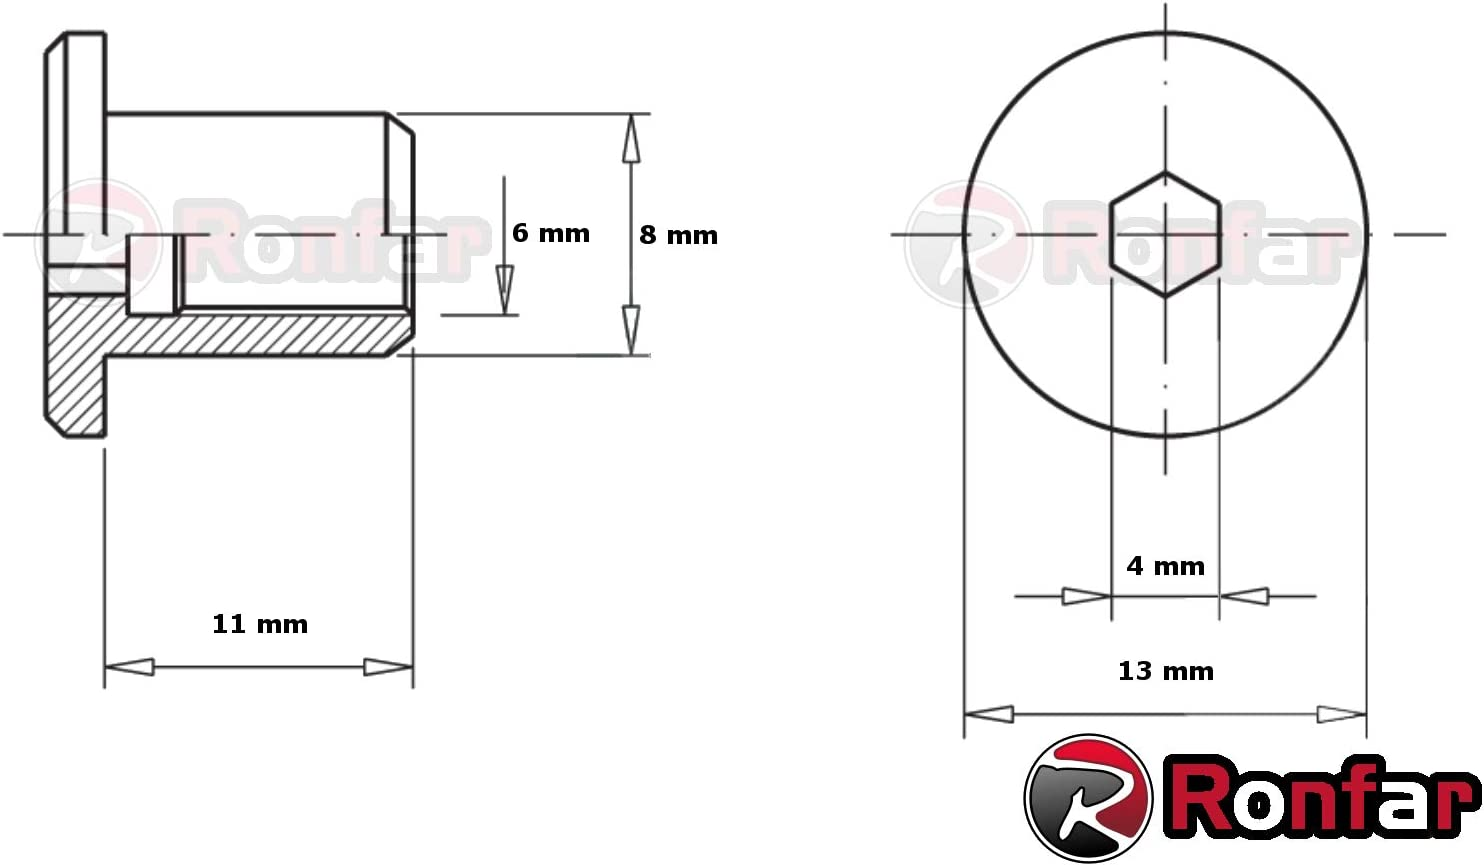 RONFAR H/ülsenmutter mit Flachkopf-Innensechskant M6 x 15 x 12 mm 50 St/ück